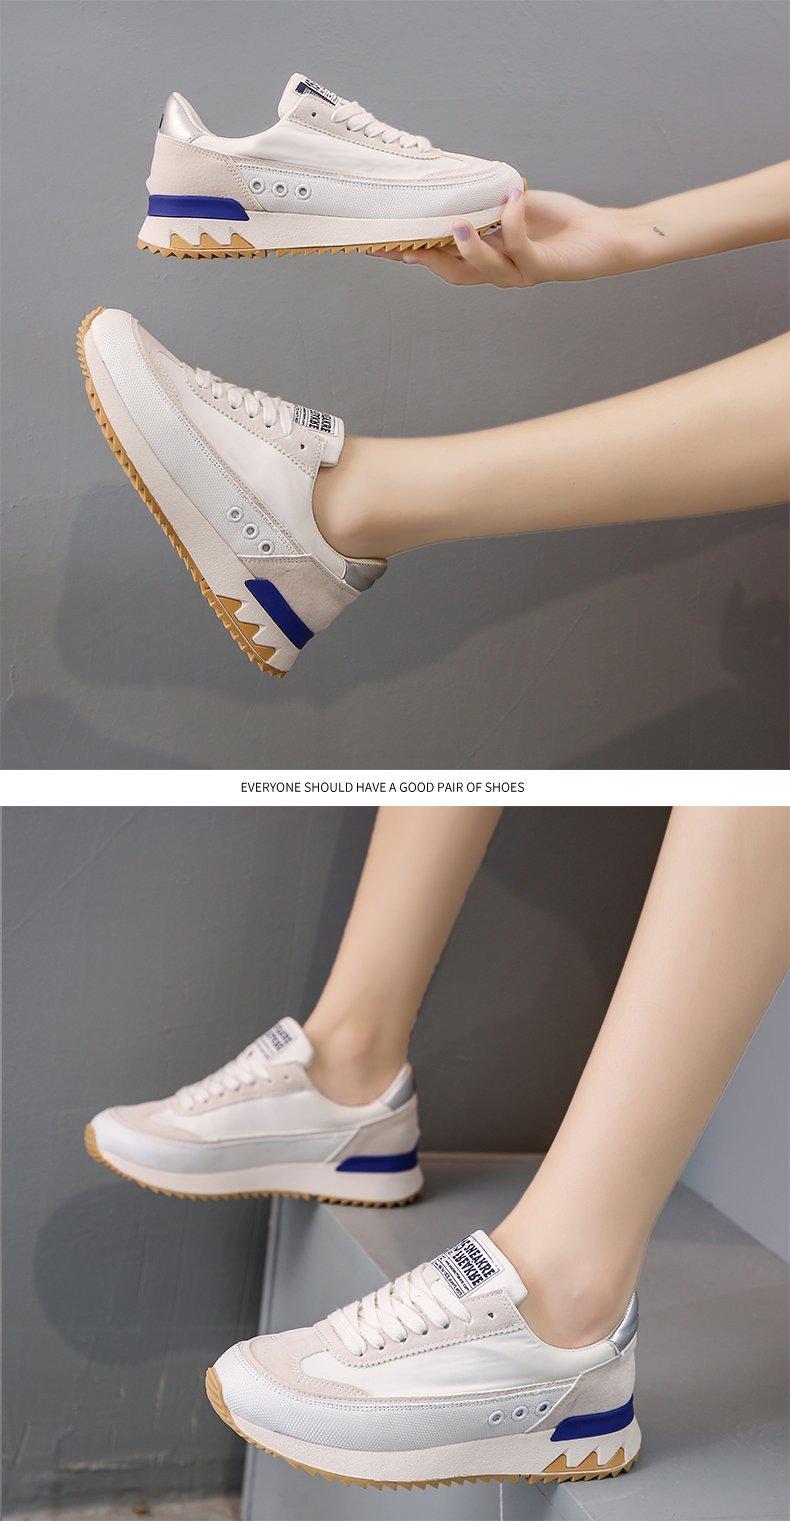 2021 primavera moda sapatos femininos rendas até tênis zapatos de mujer